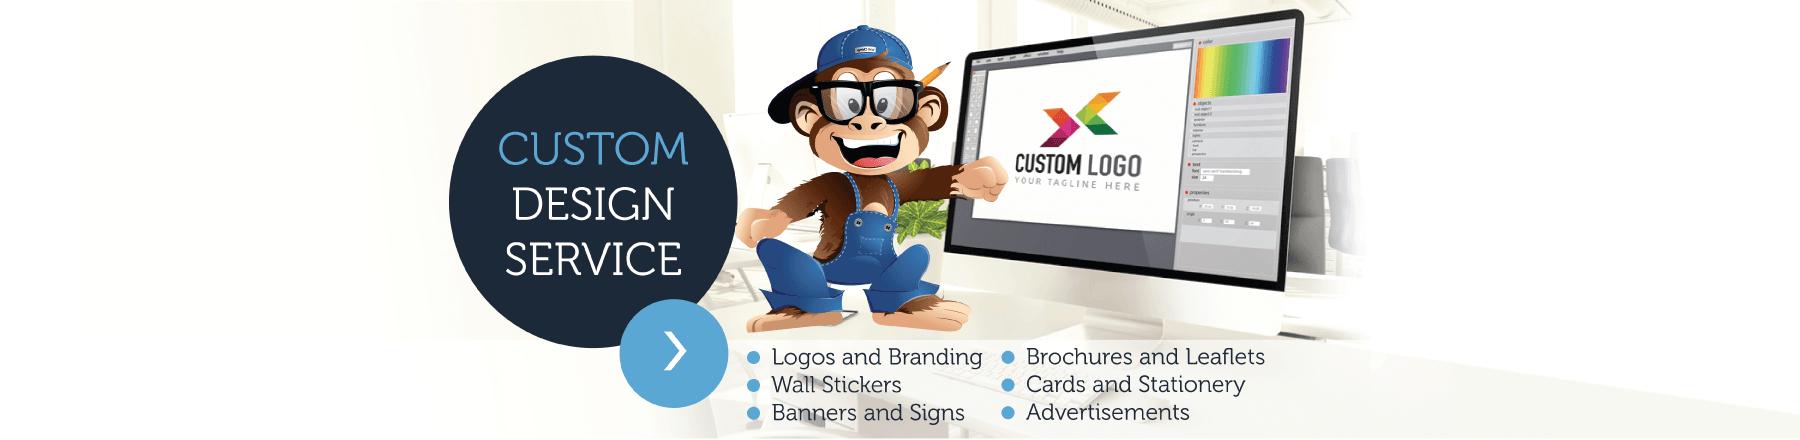 Custom Design Service